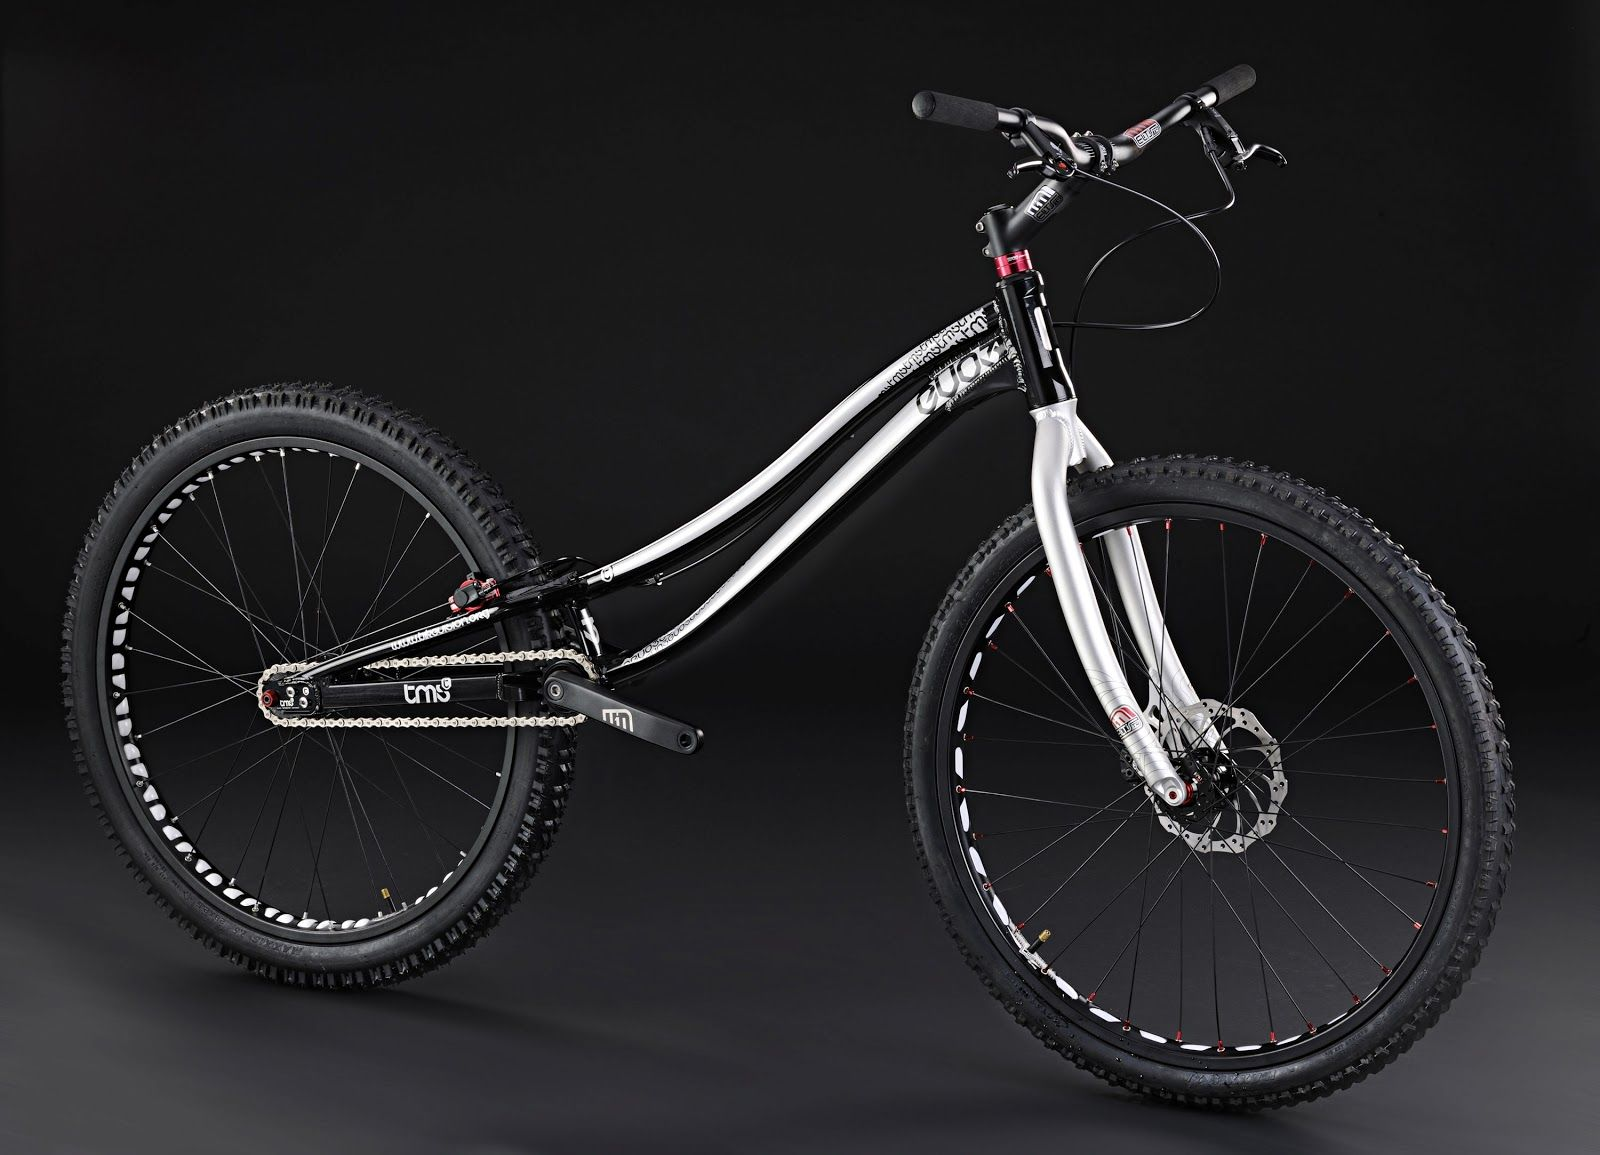 trial bike bikecrazy bike trial bike e bicycle. Black Bedroom Furniture Sets. Home Design Ideas